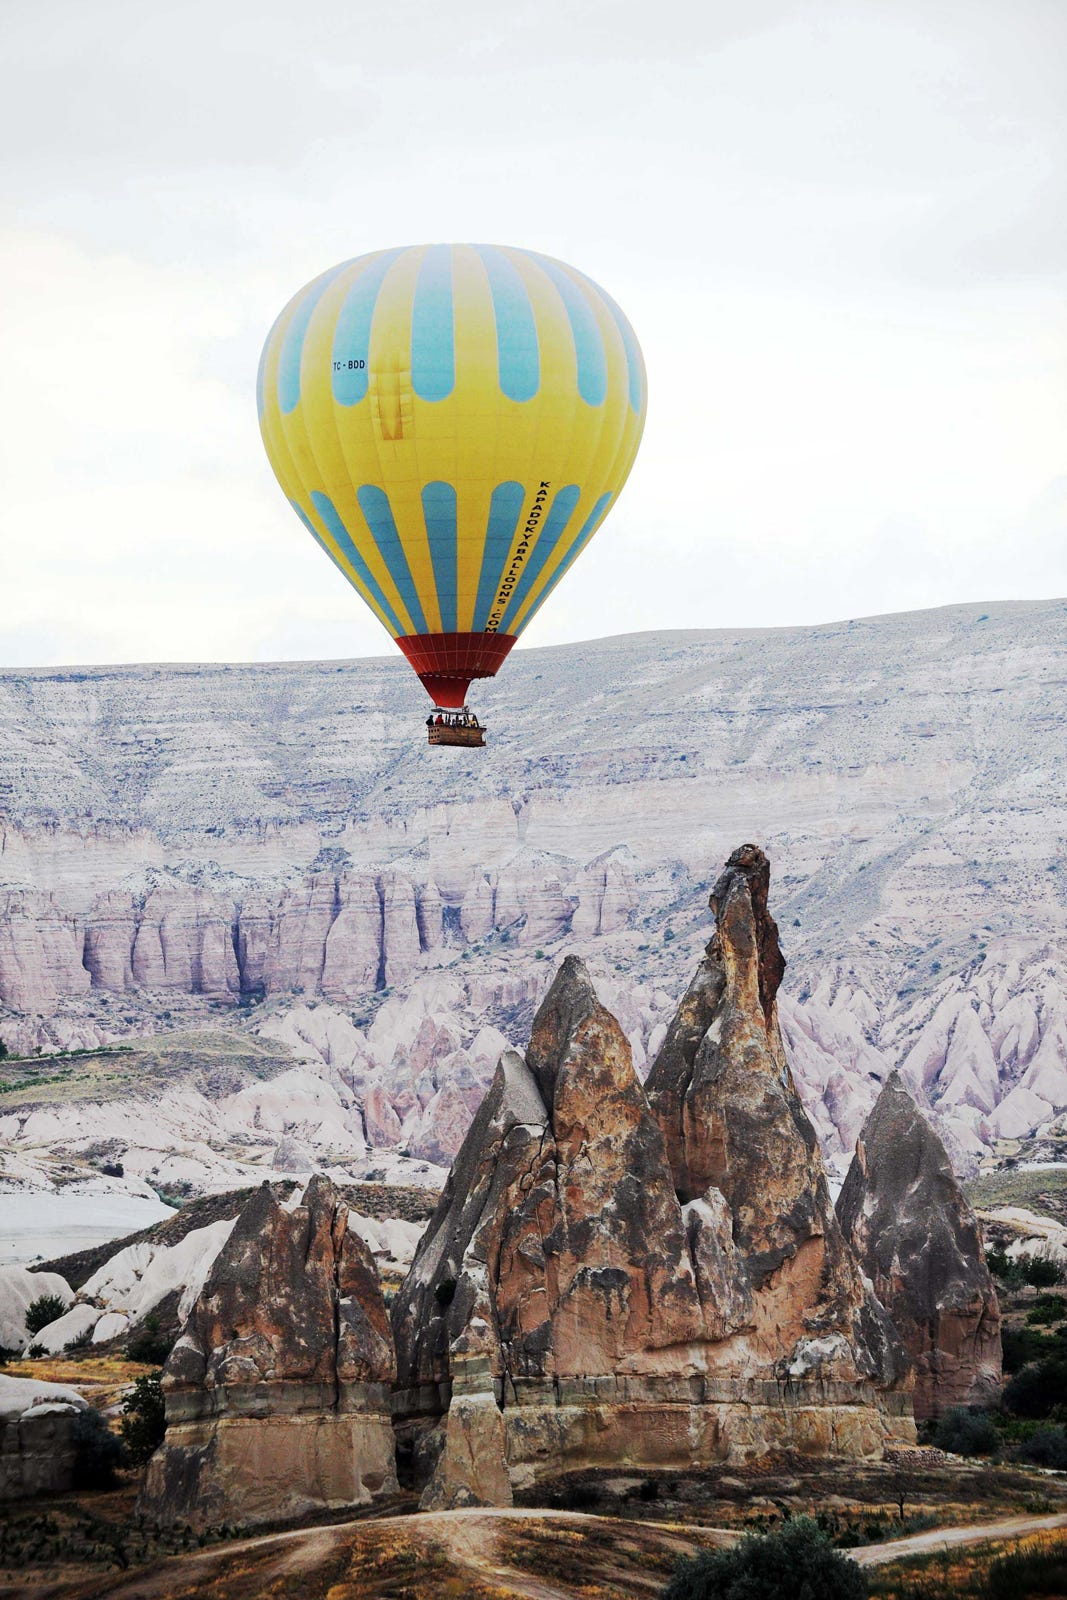 luxury travel for singles over 50